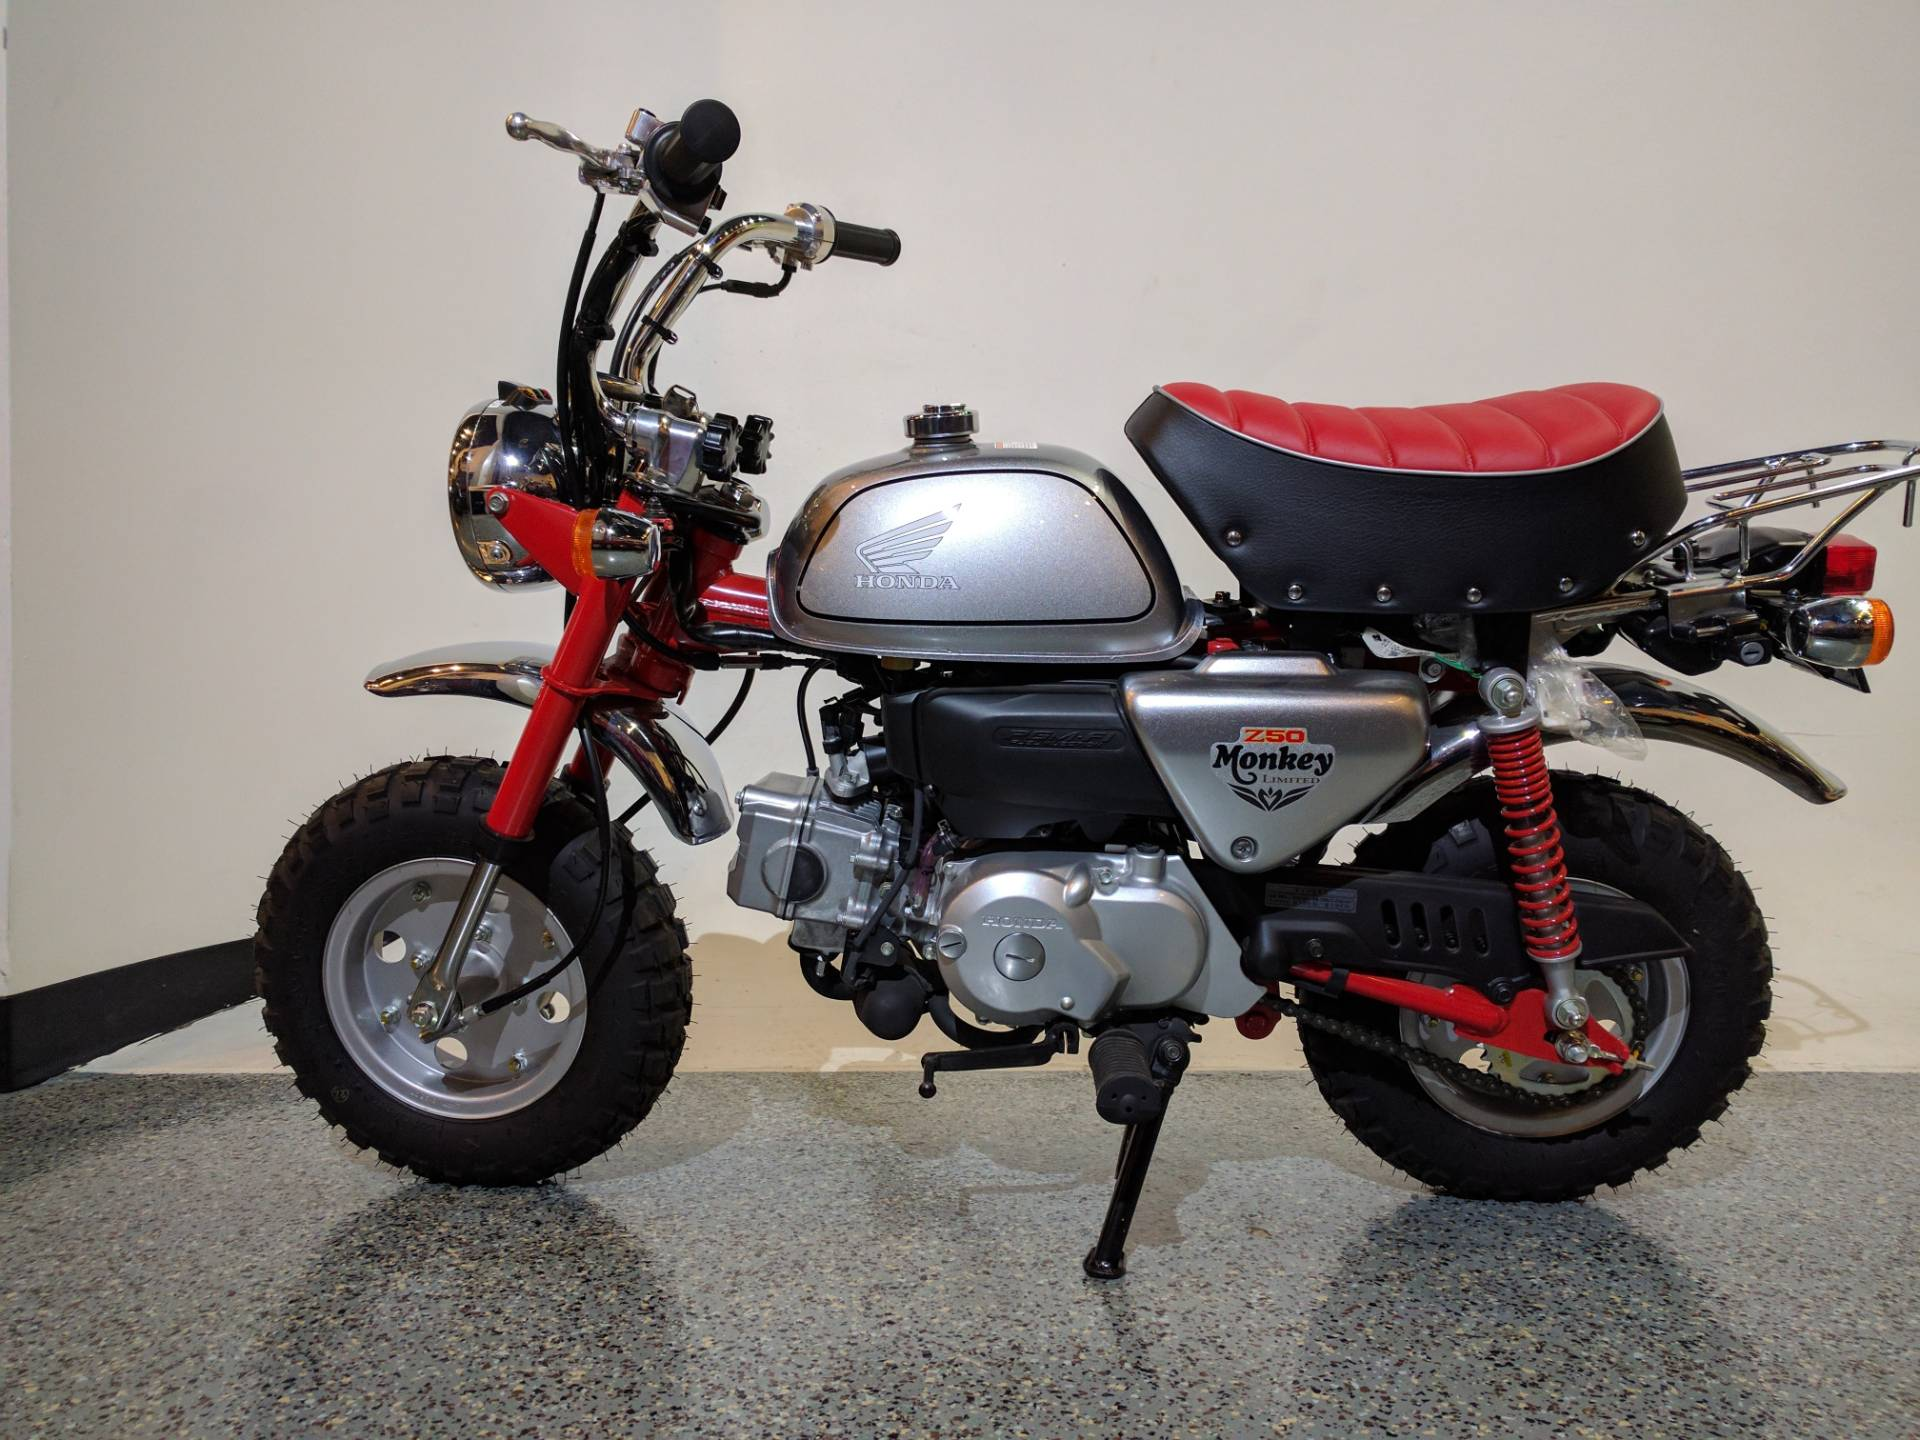 2012 honda z50 monkey silver / red motorcycles canton ohio mc534